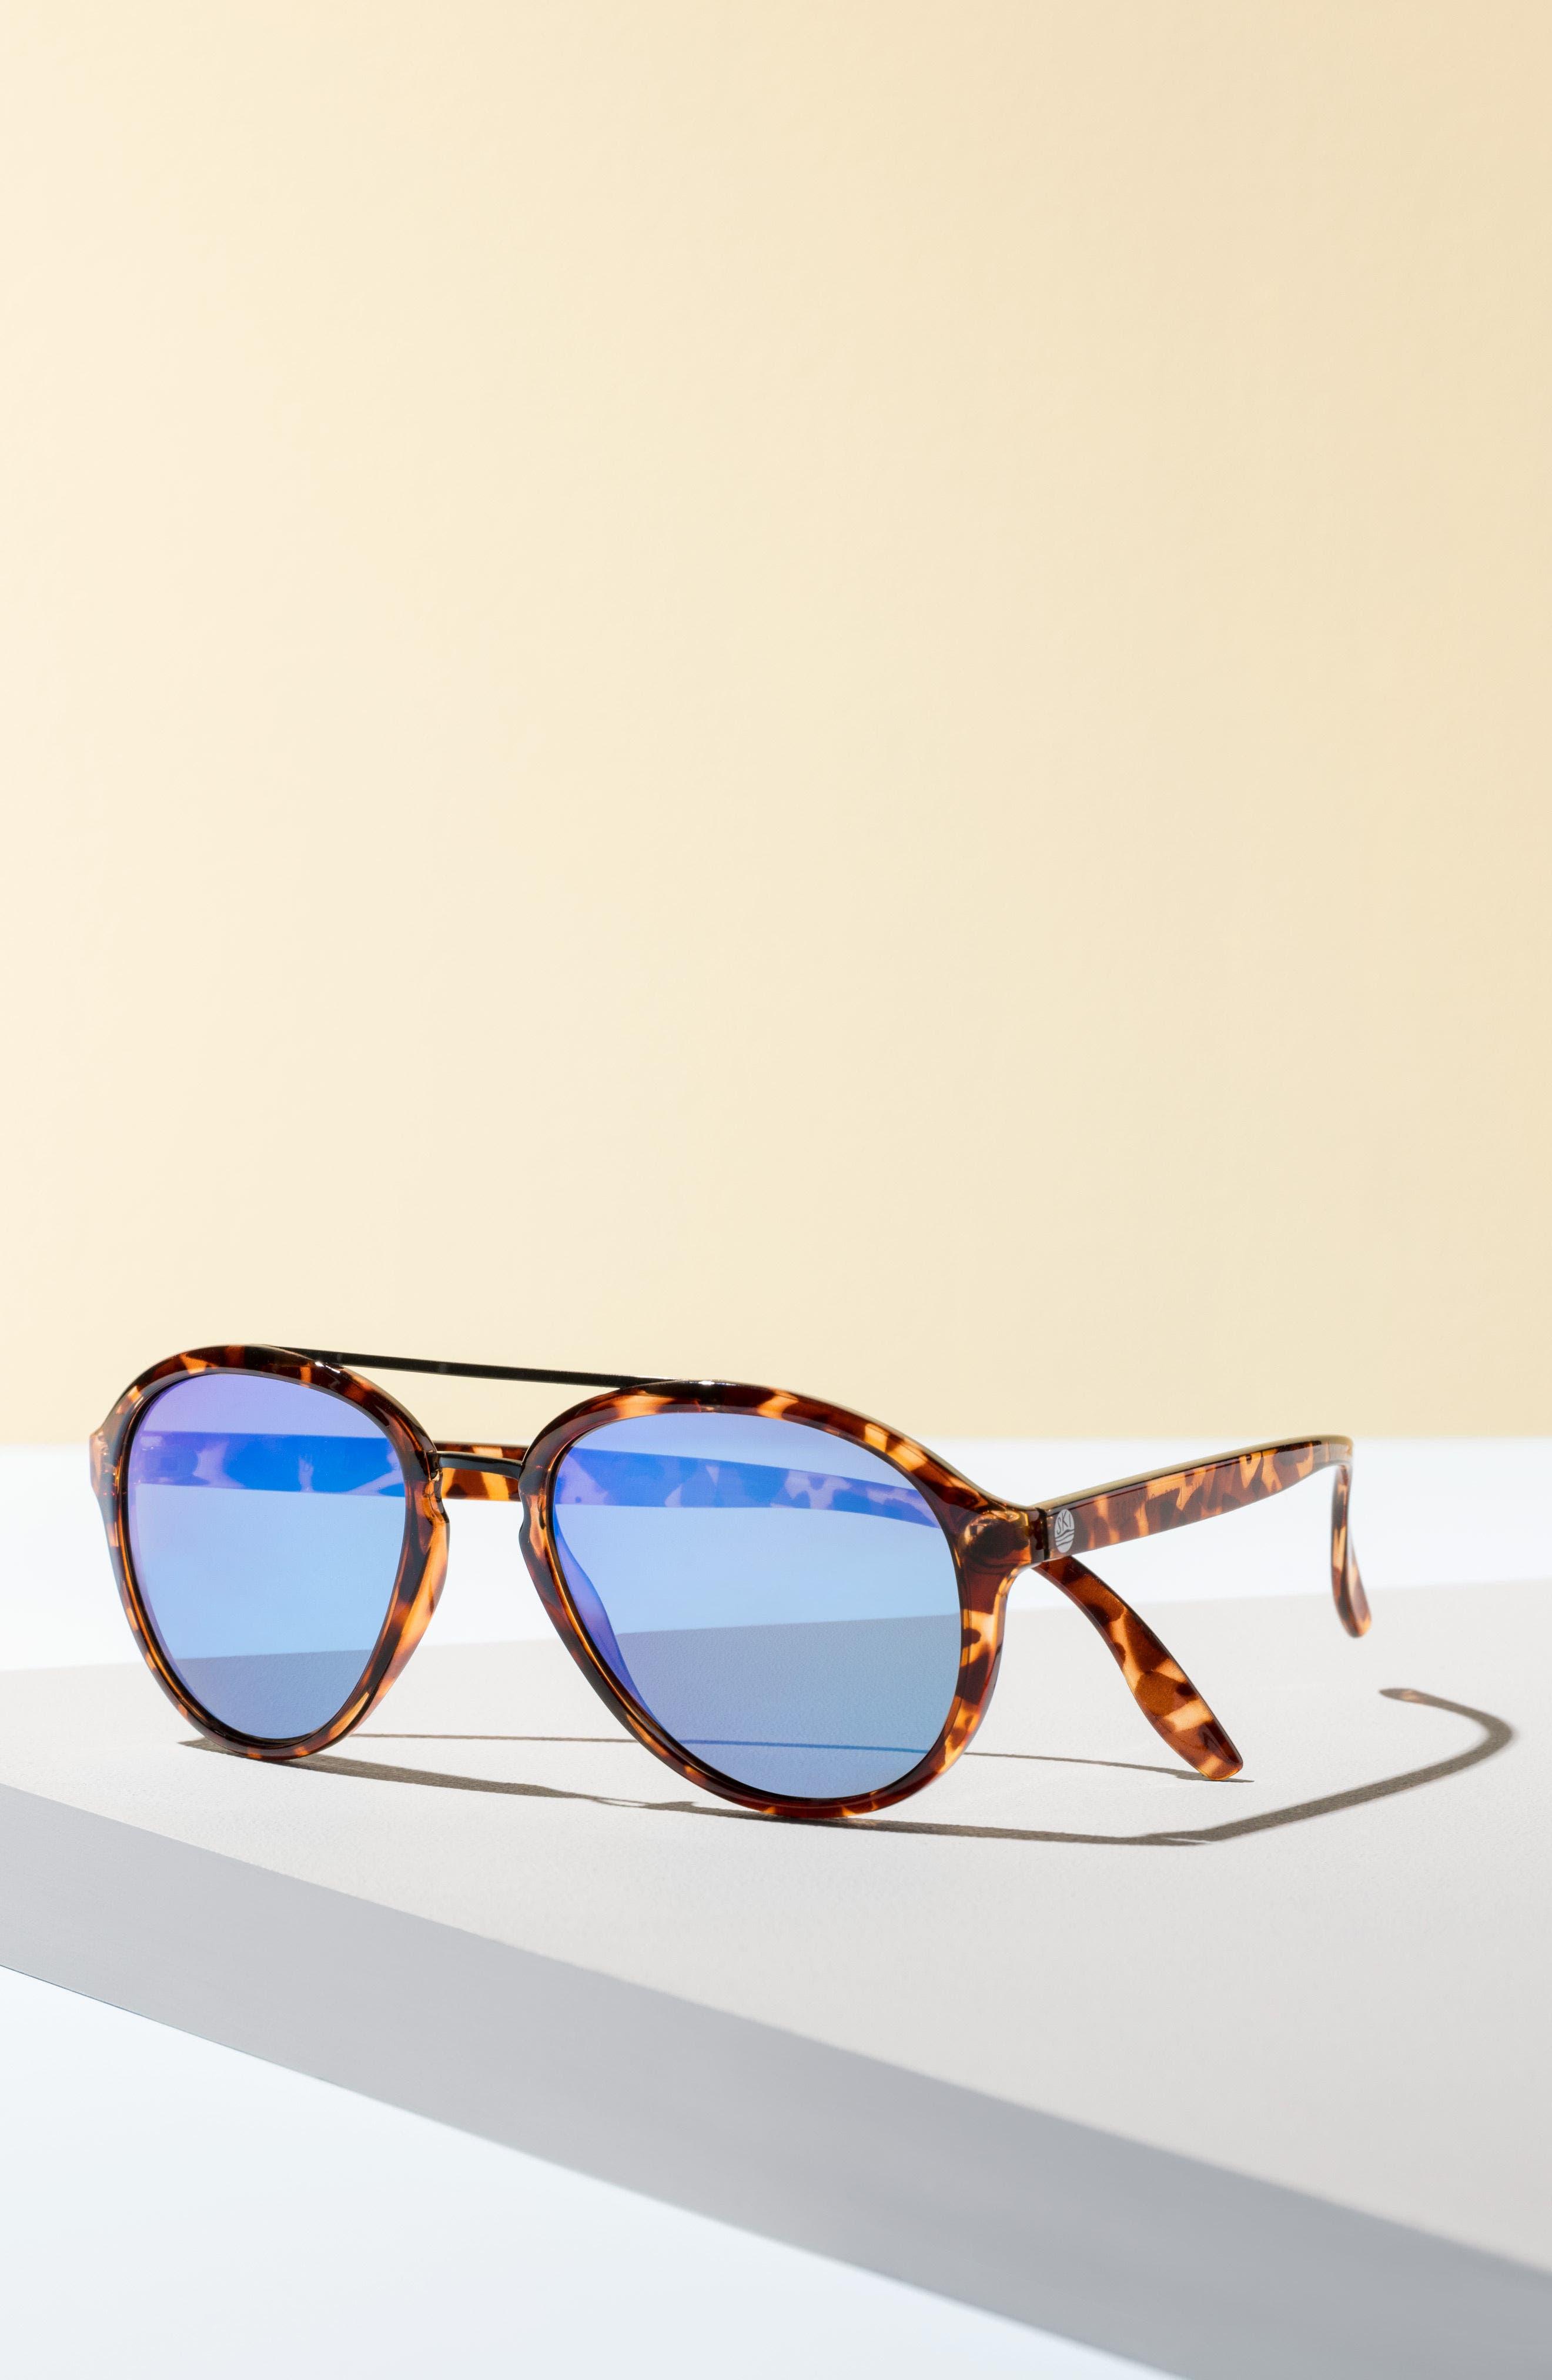 Plover 60mm Polarized Sunglasses,                             Alternate thumbnail 4, color,